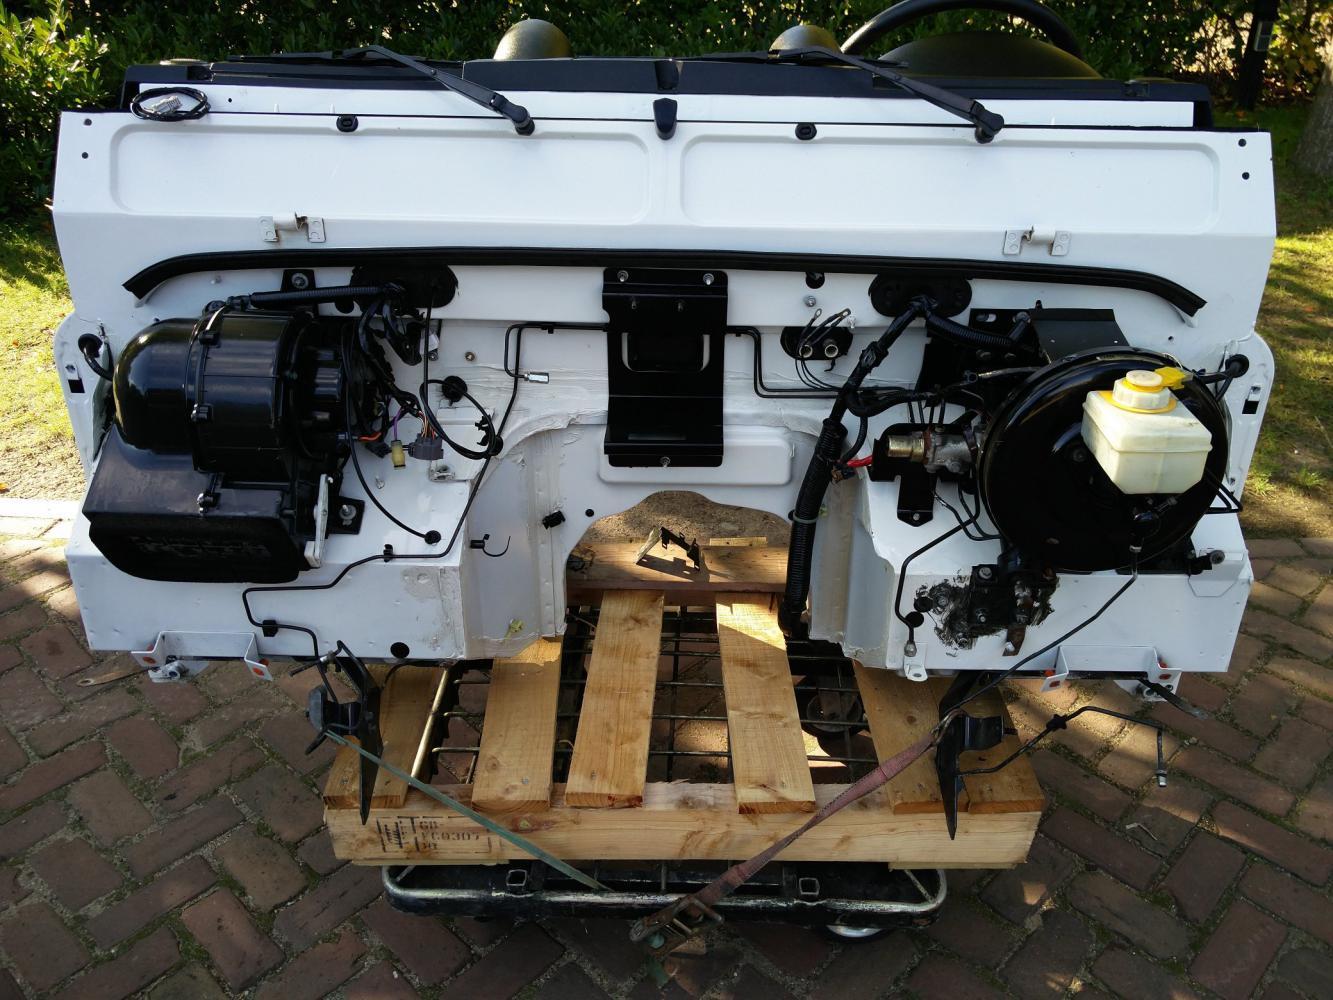 Click image for larger version  Name:Parts Landrover Defender Puma Dash 5 engine complete.jpg Views:184 Size:194.8 KB ID:302193